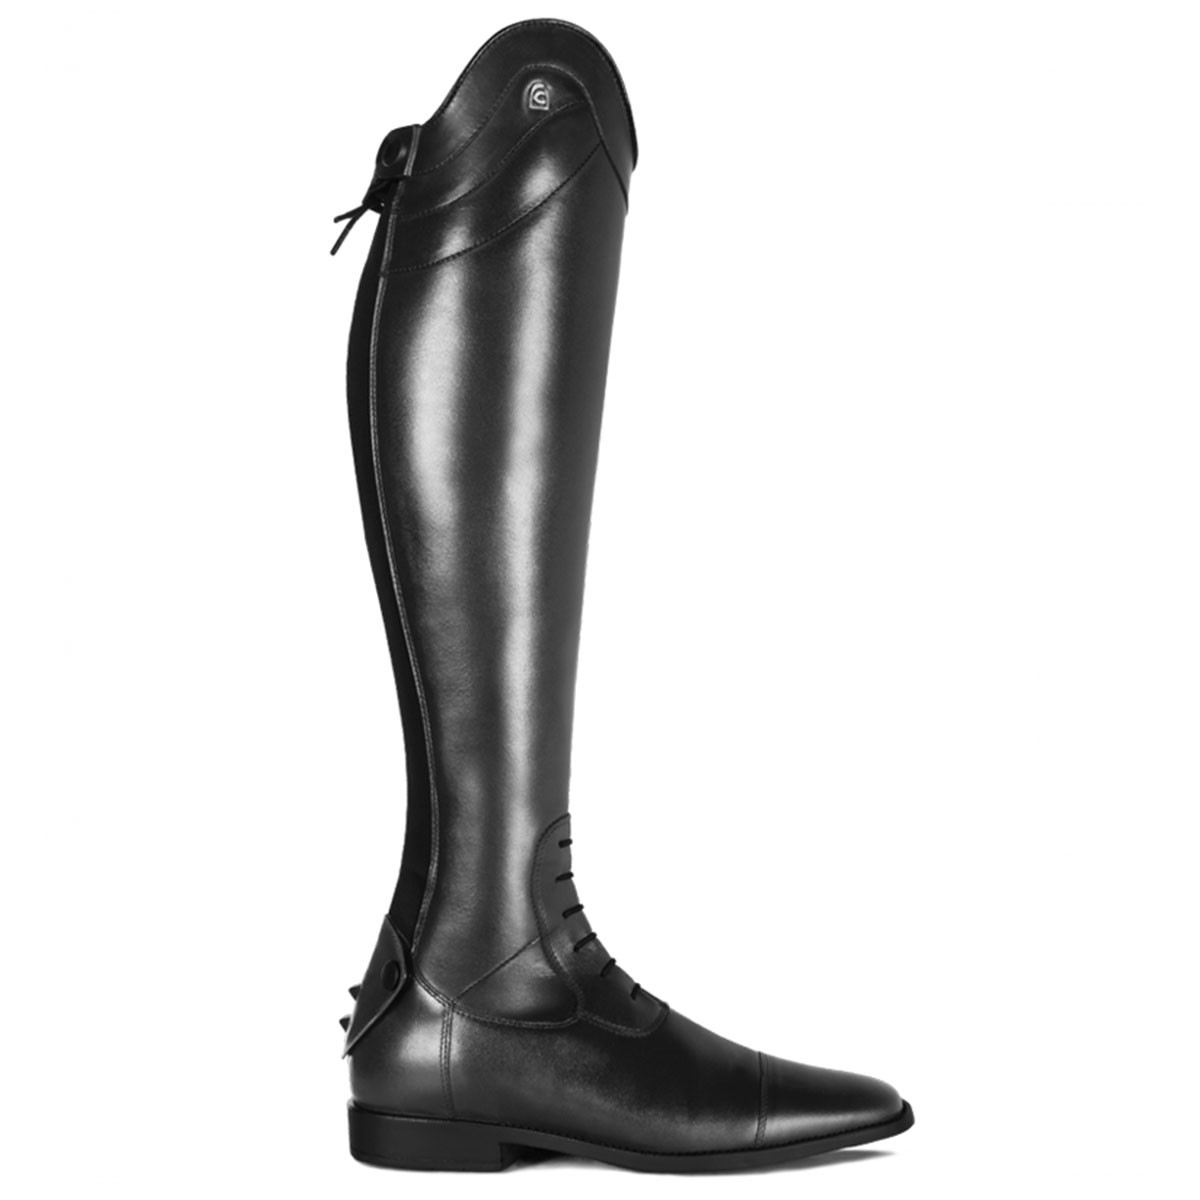 Cavallo Linus Slim rijlaars zwart maat:5-5.5 / h47-w31